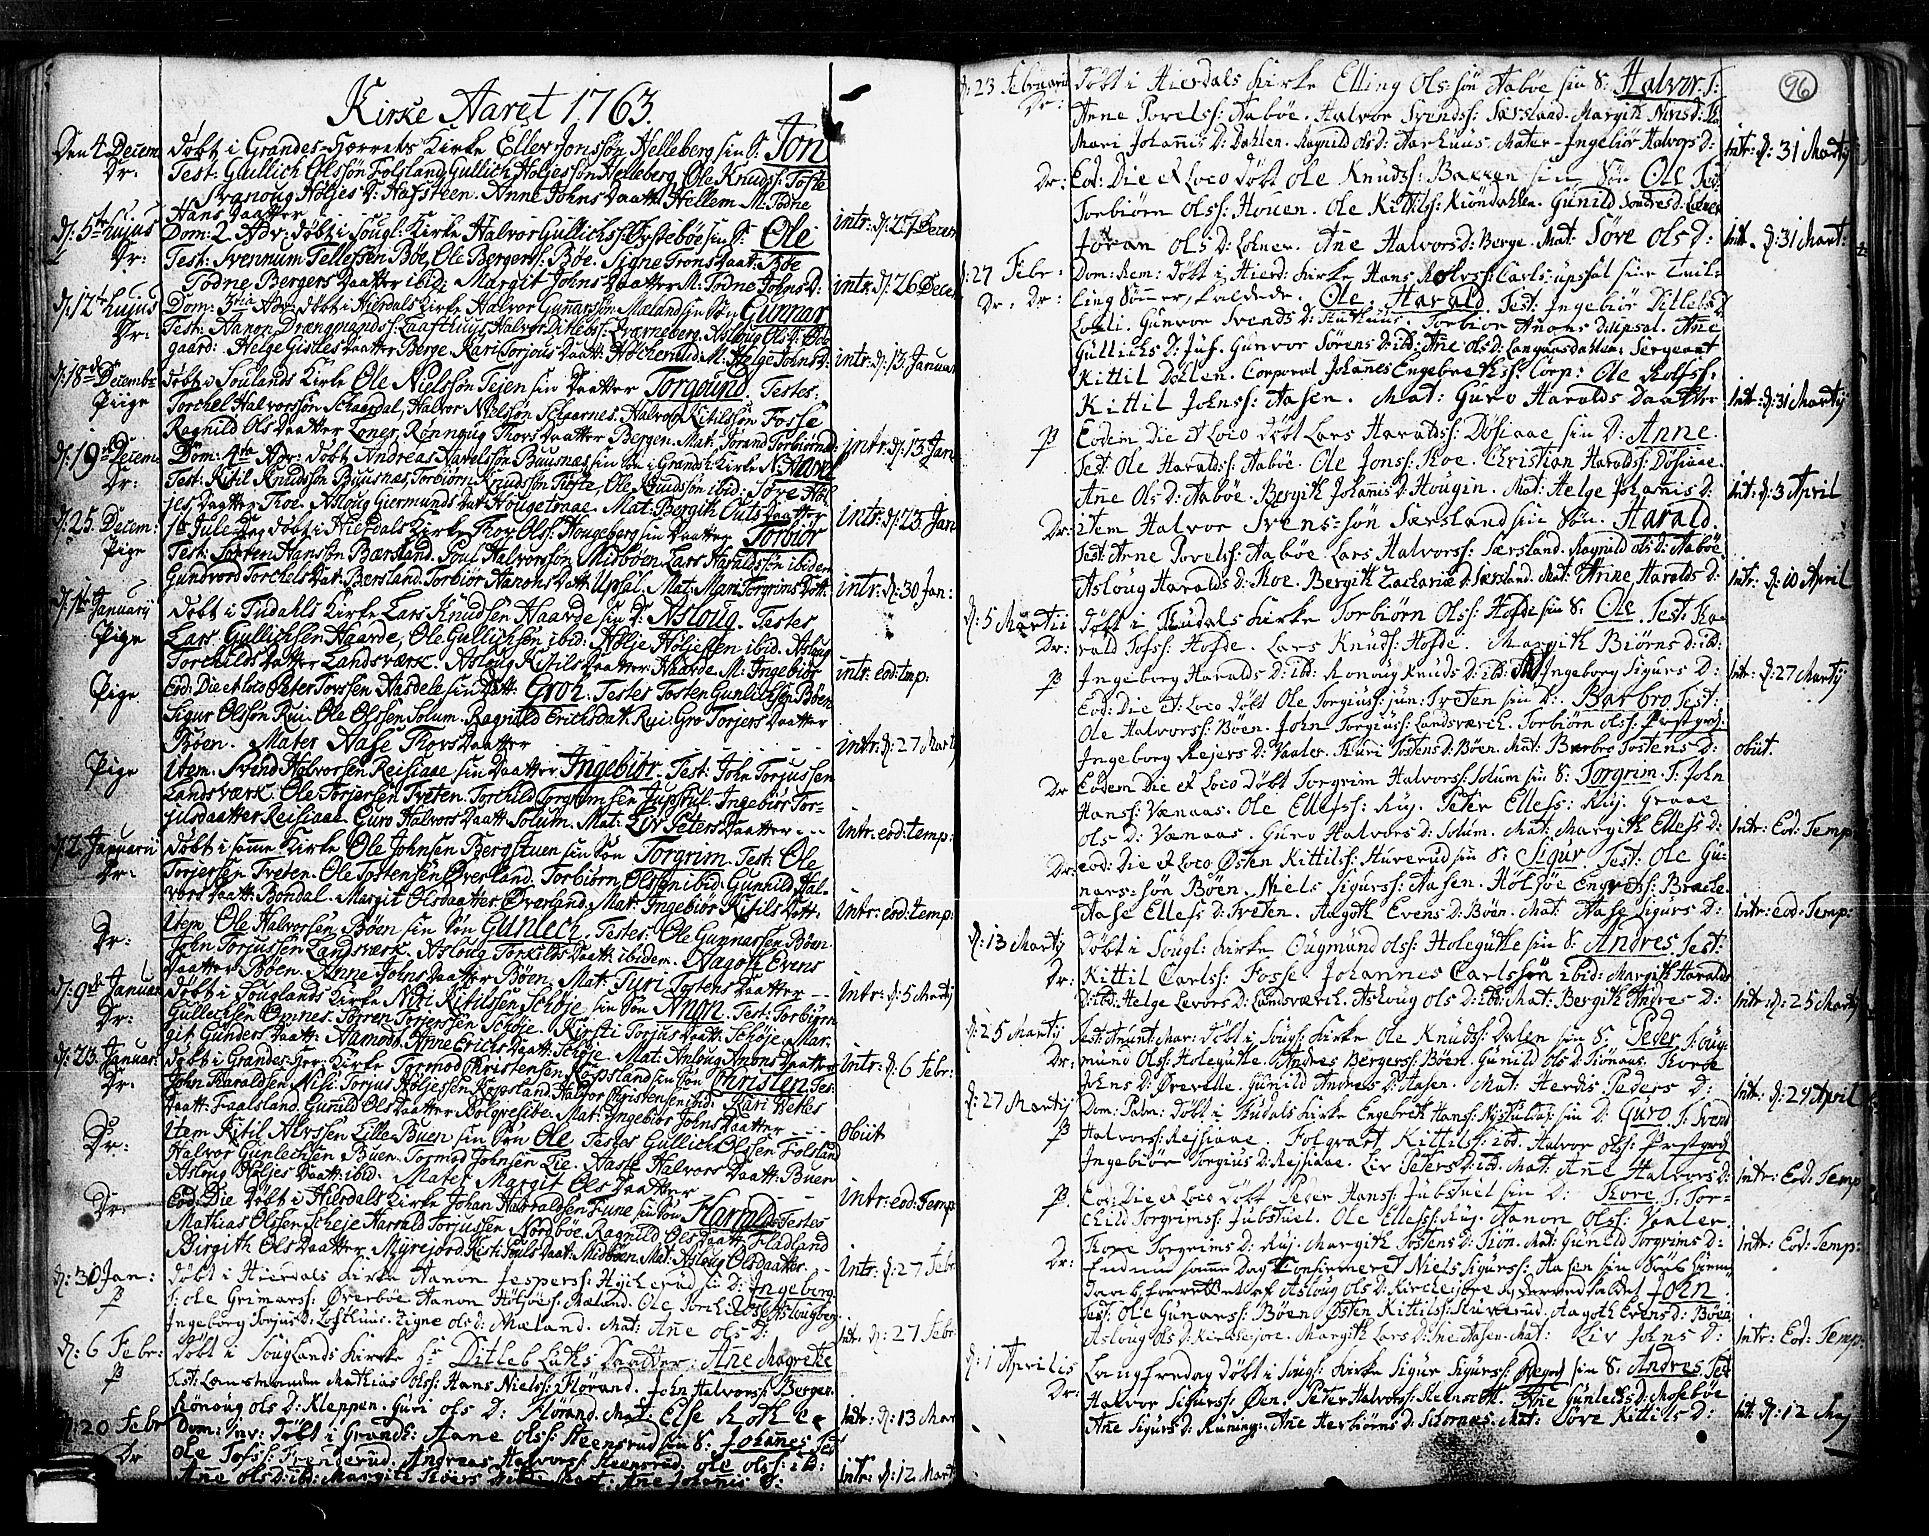 SAKO, Hjartdal kirkebøker, F/Fa/L0003: Ministerialbok nr. I 3, 1727-1775, s. 96